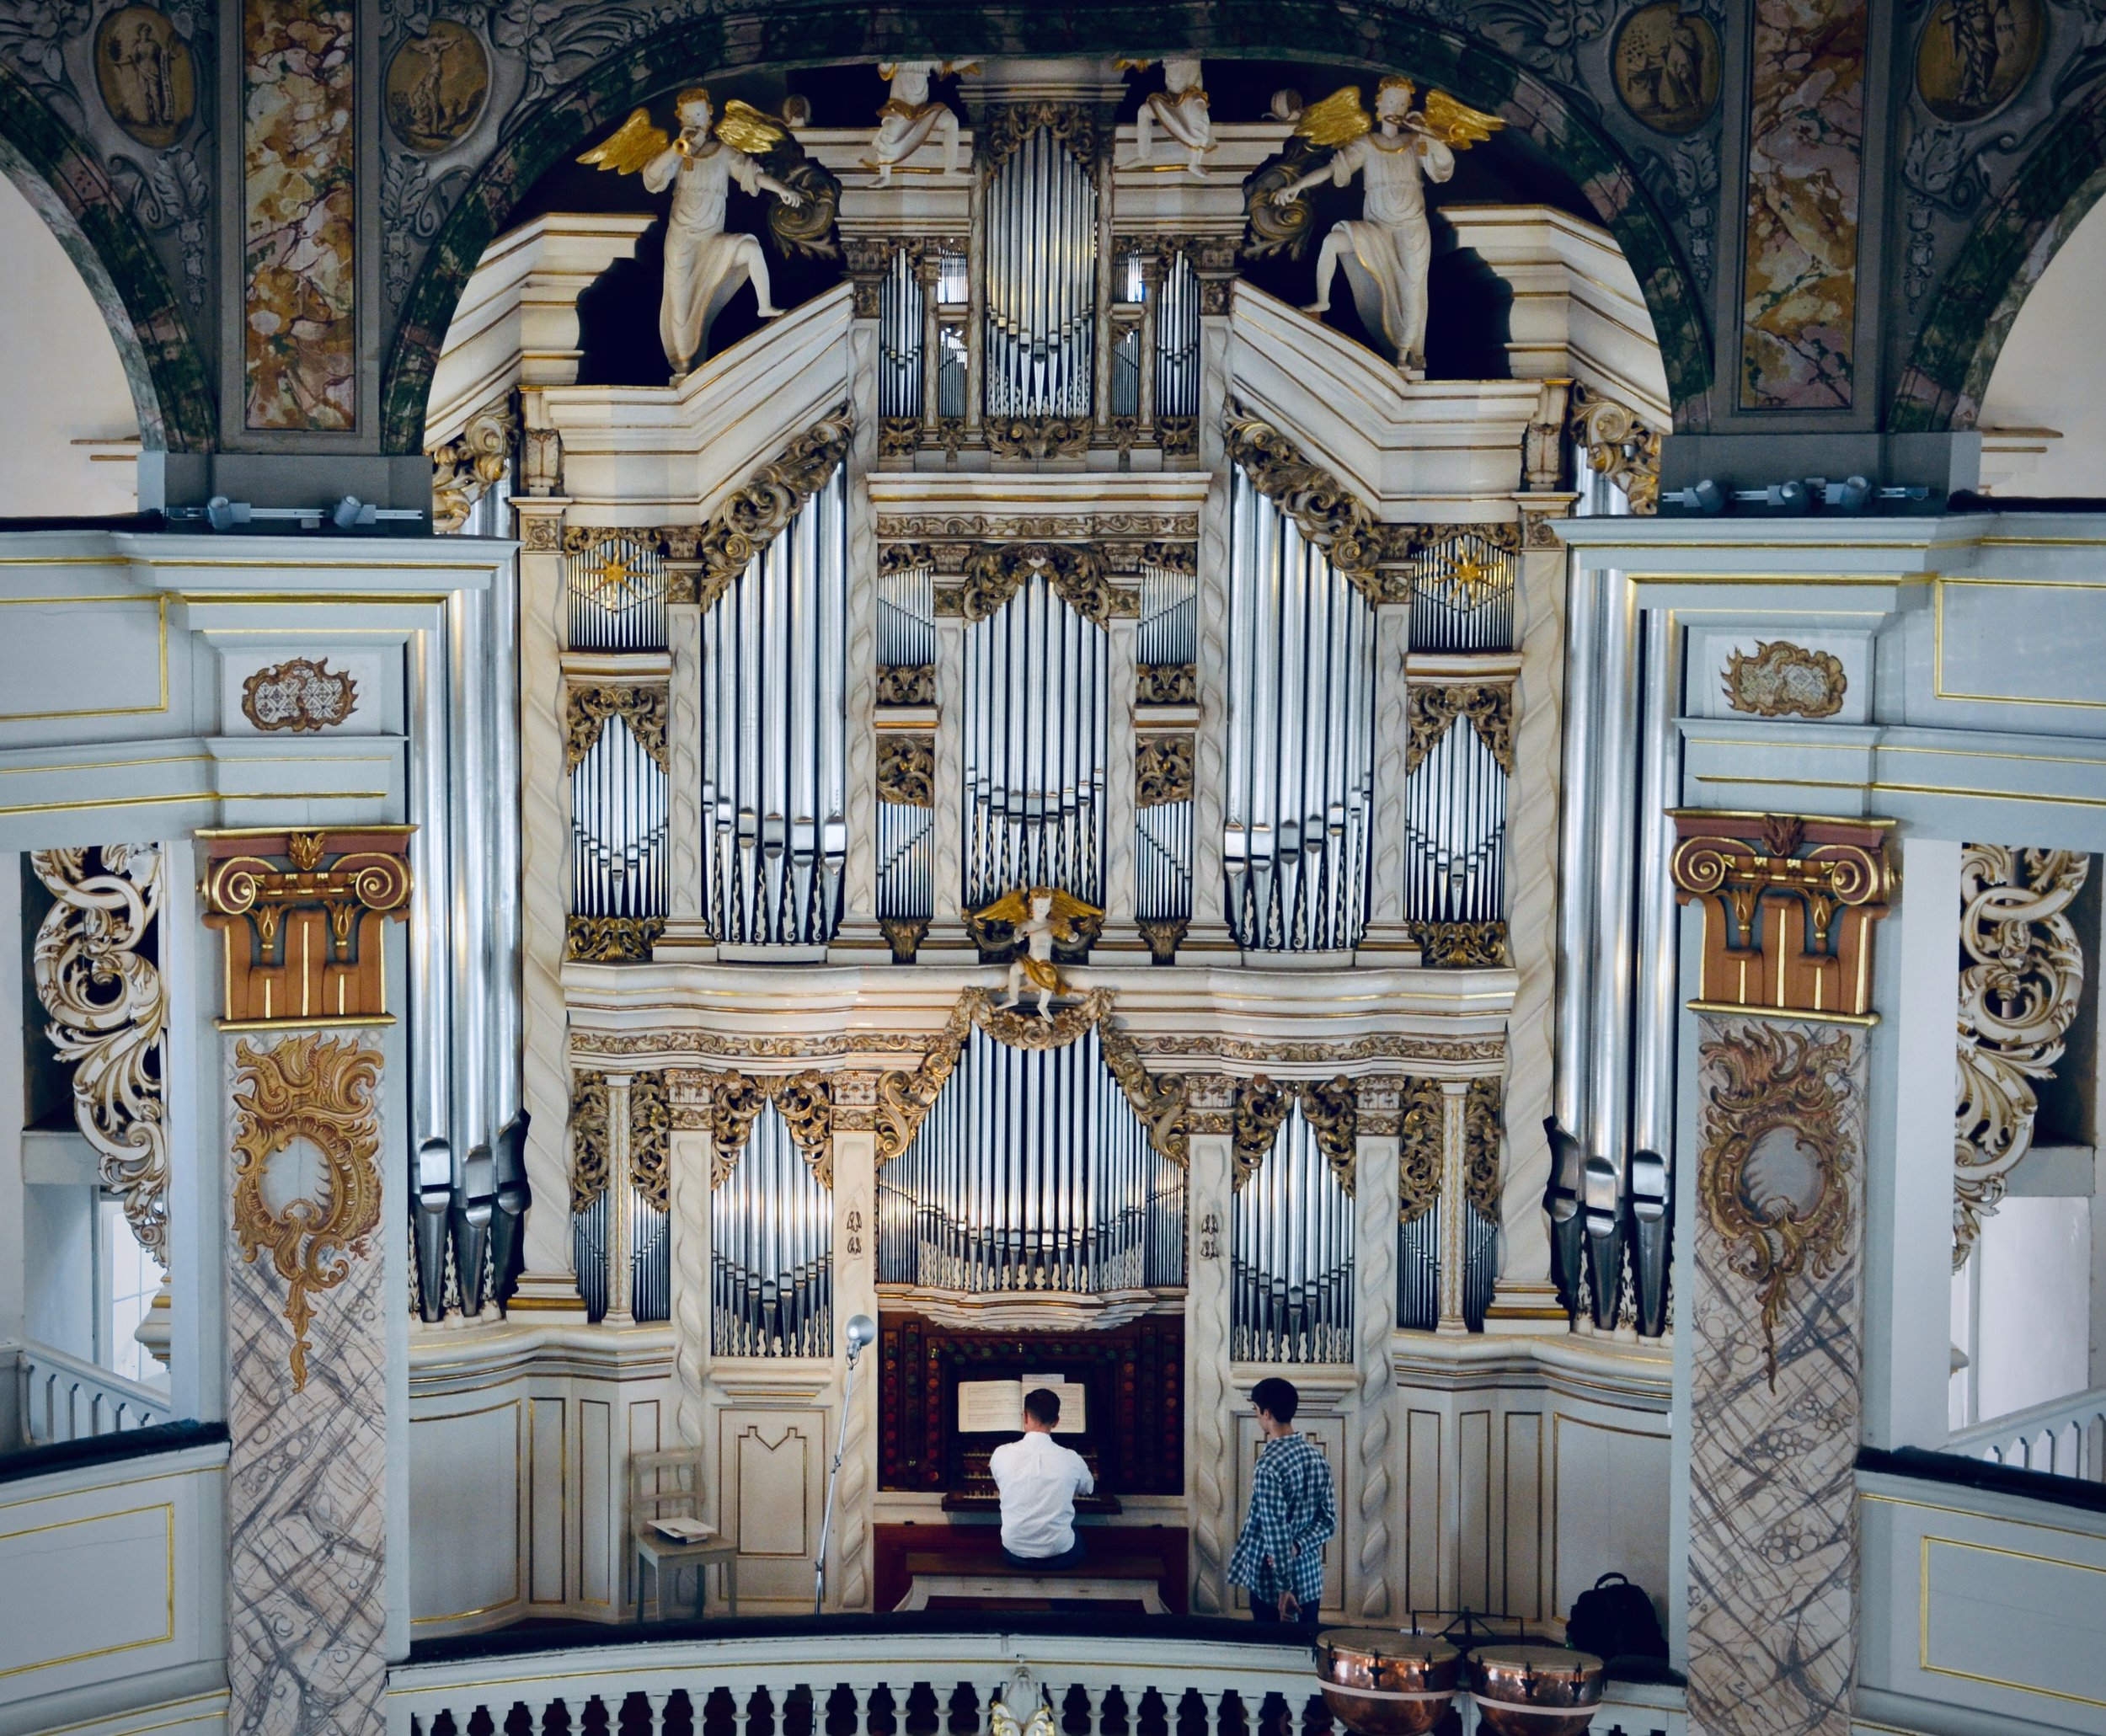 Christian Lane plays the 1730 Trost Organ, Stadtkirche, Waltershausen.